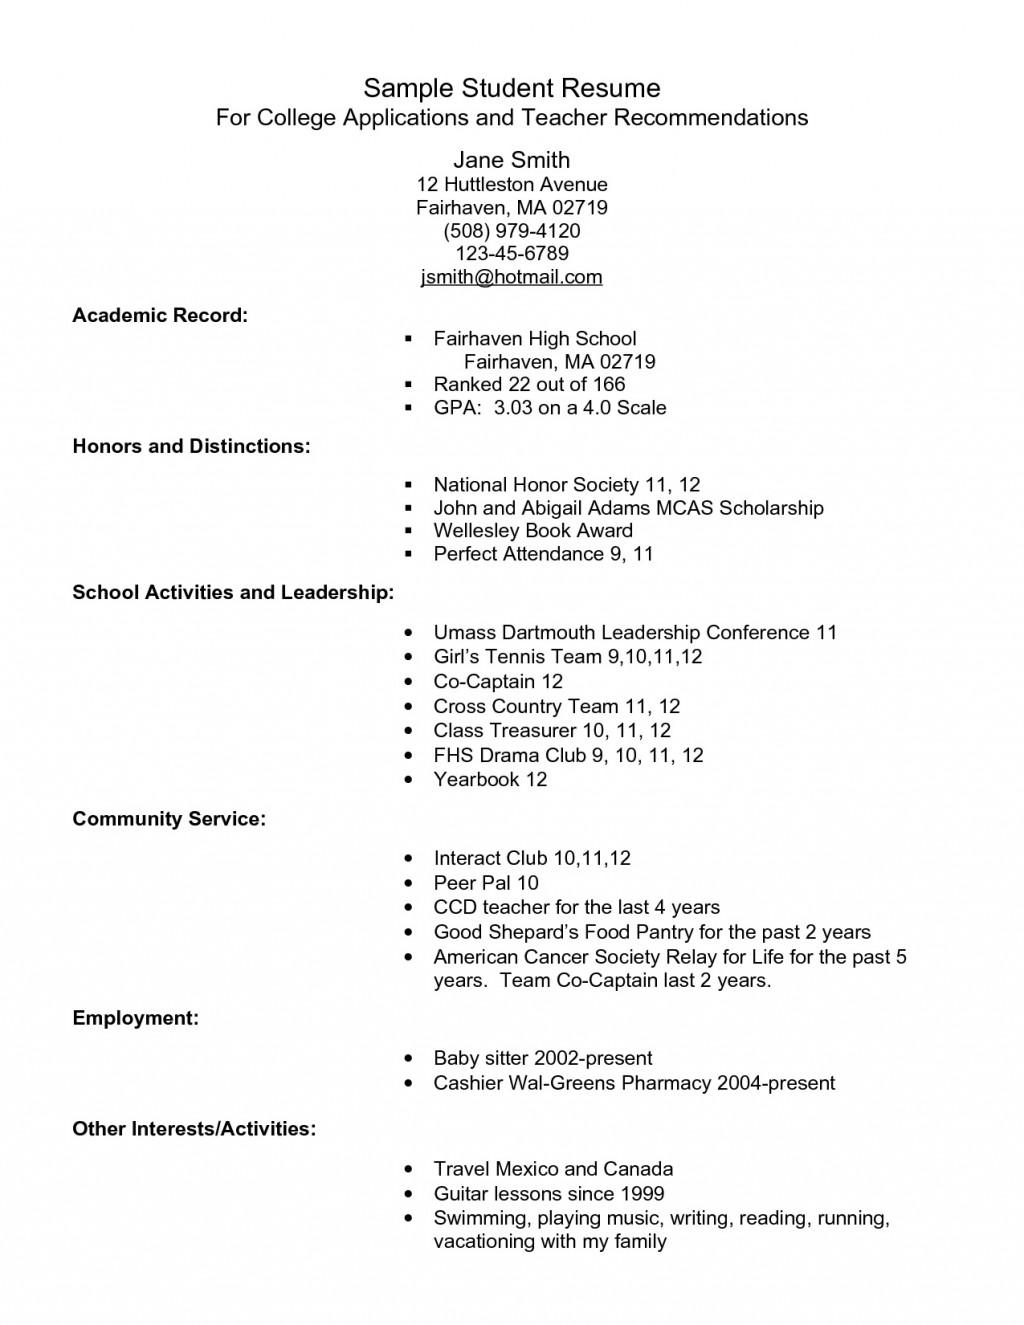 004 Impressive College Admission Resume Template Photo  Templates App Sample Application Microsoft WordLarge